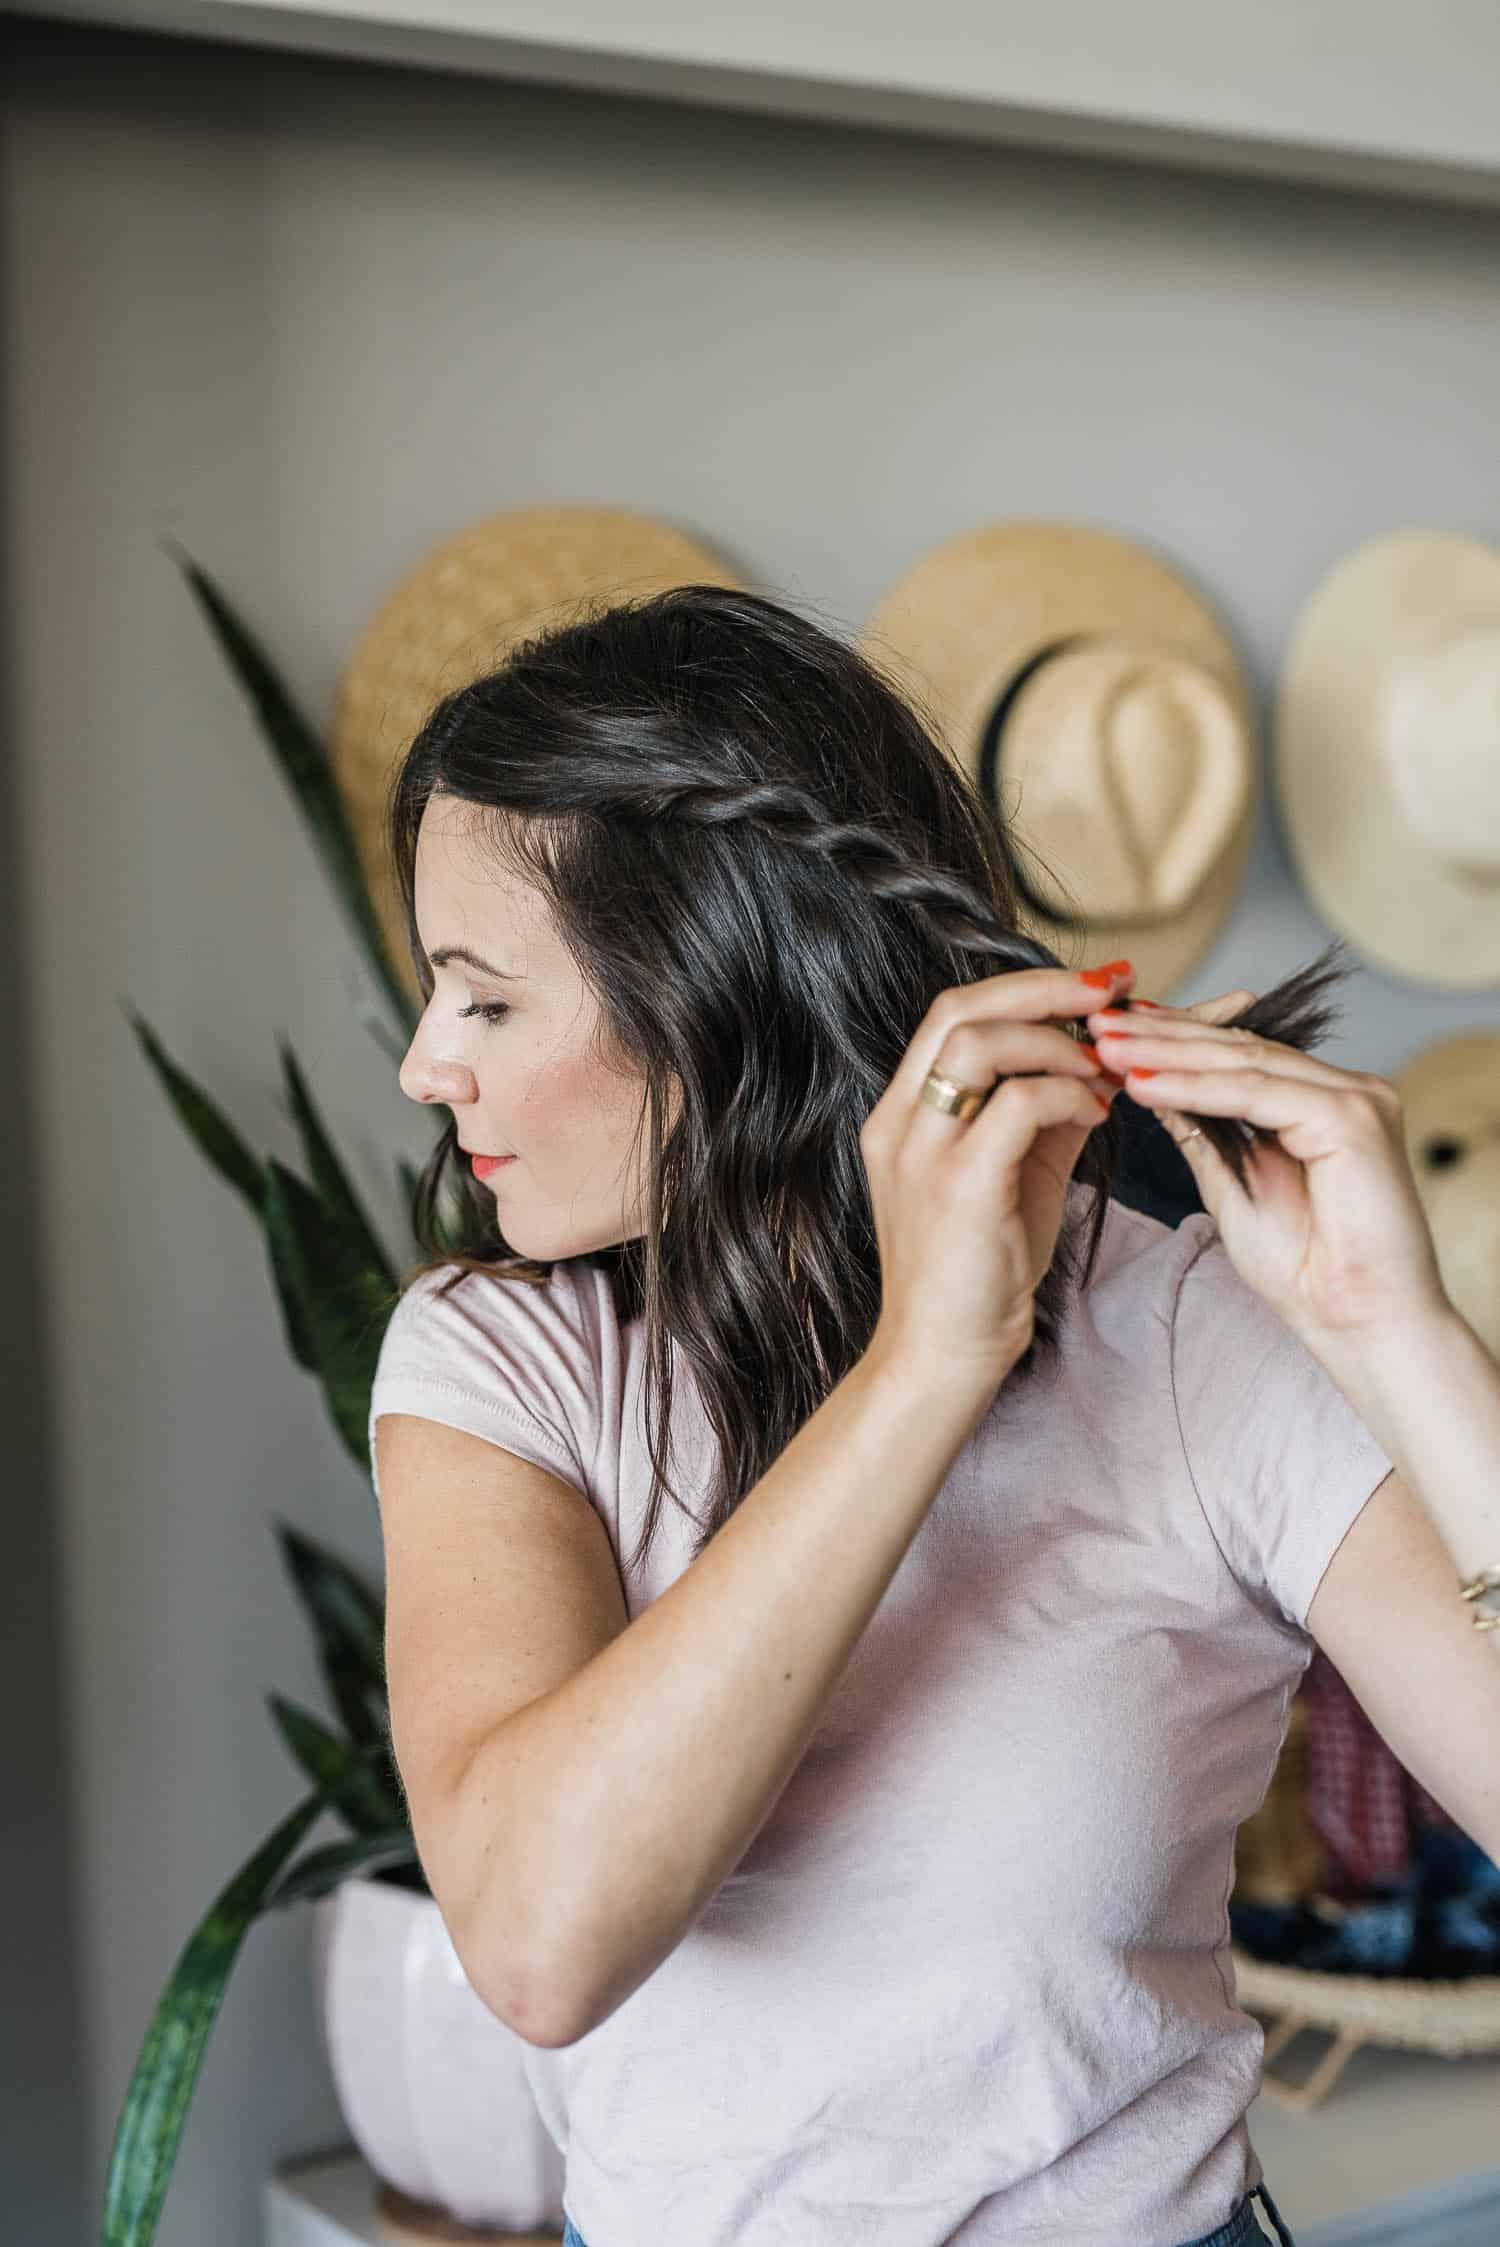 My Style Vita is sharing a hair tutorial for short hair